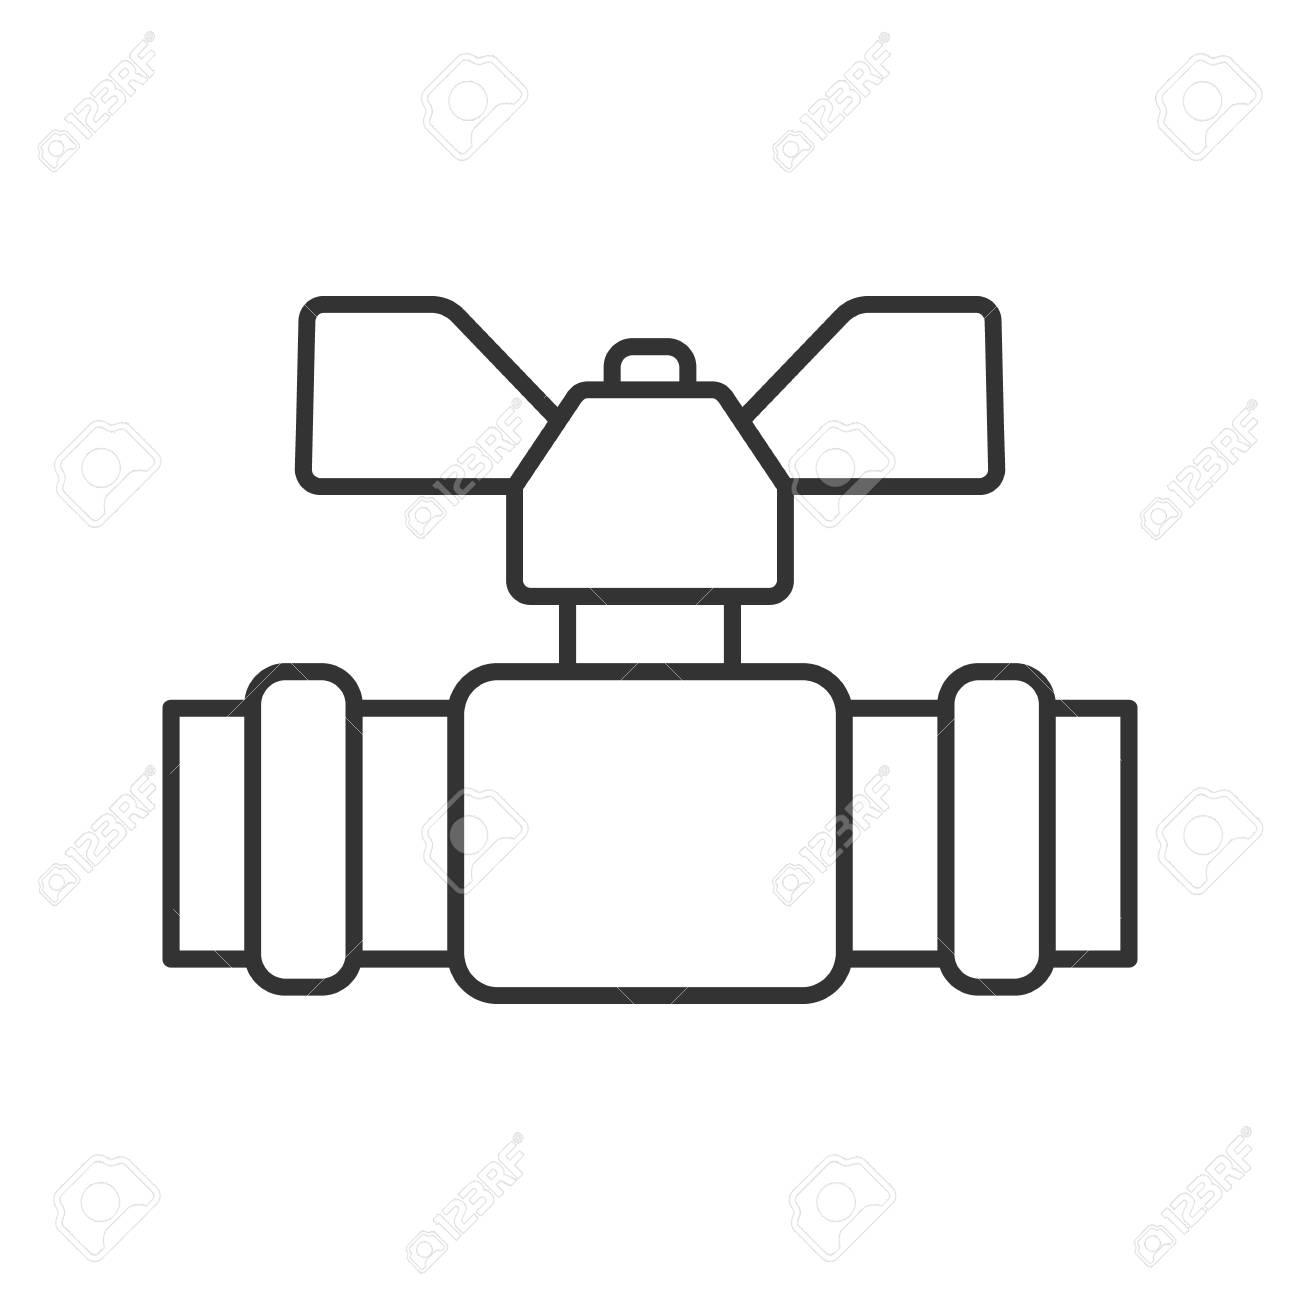 Plumbing Valve Linear Icon Thin Line Illustration Water Tap